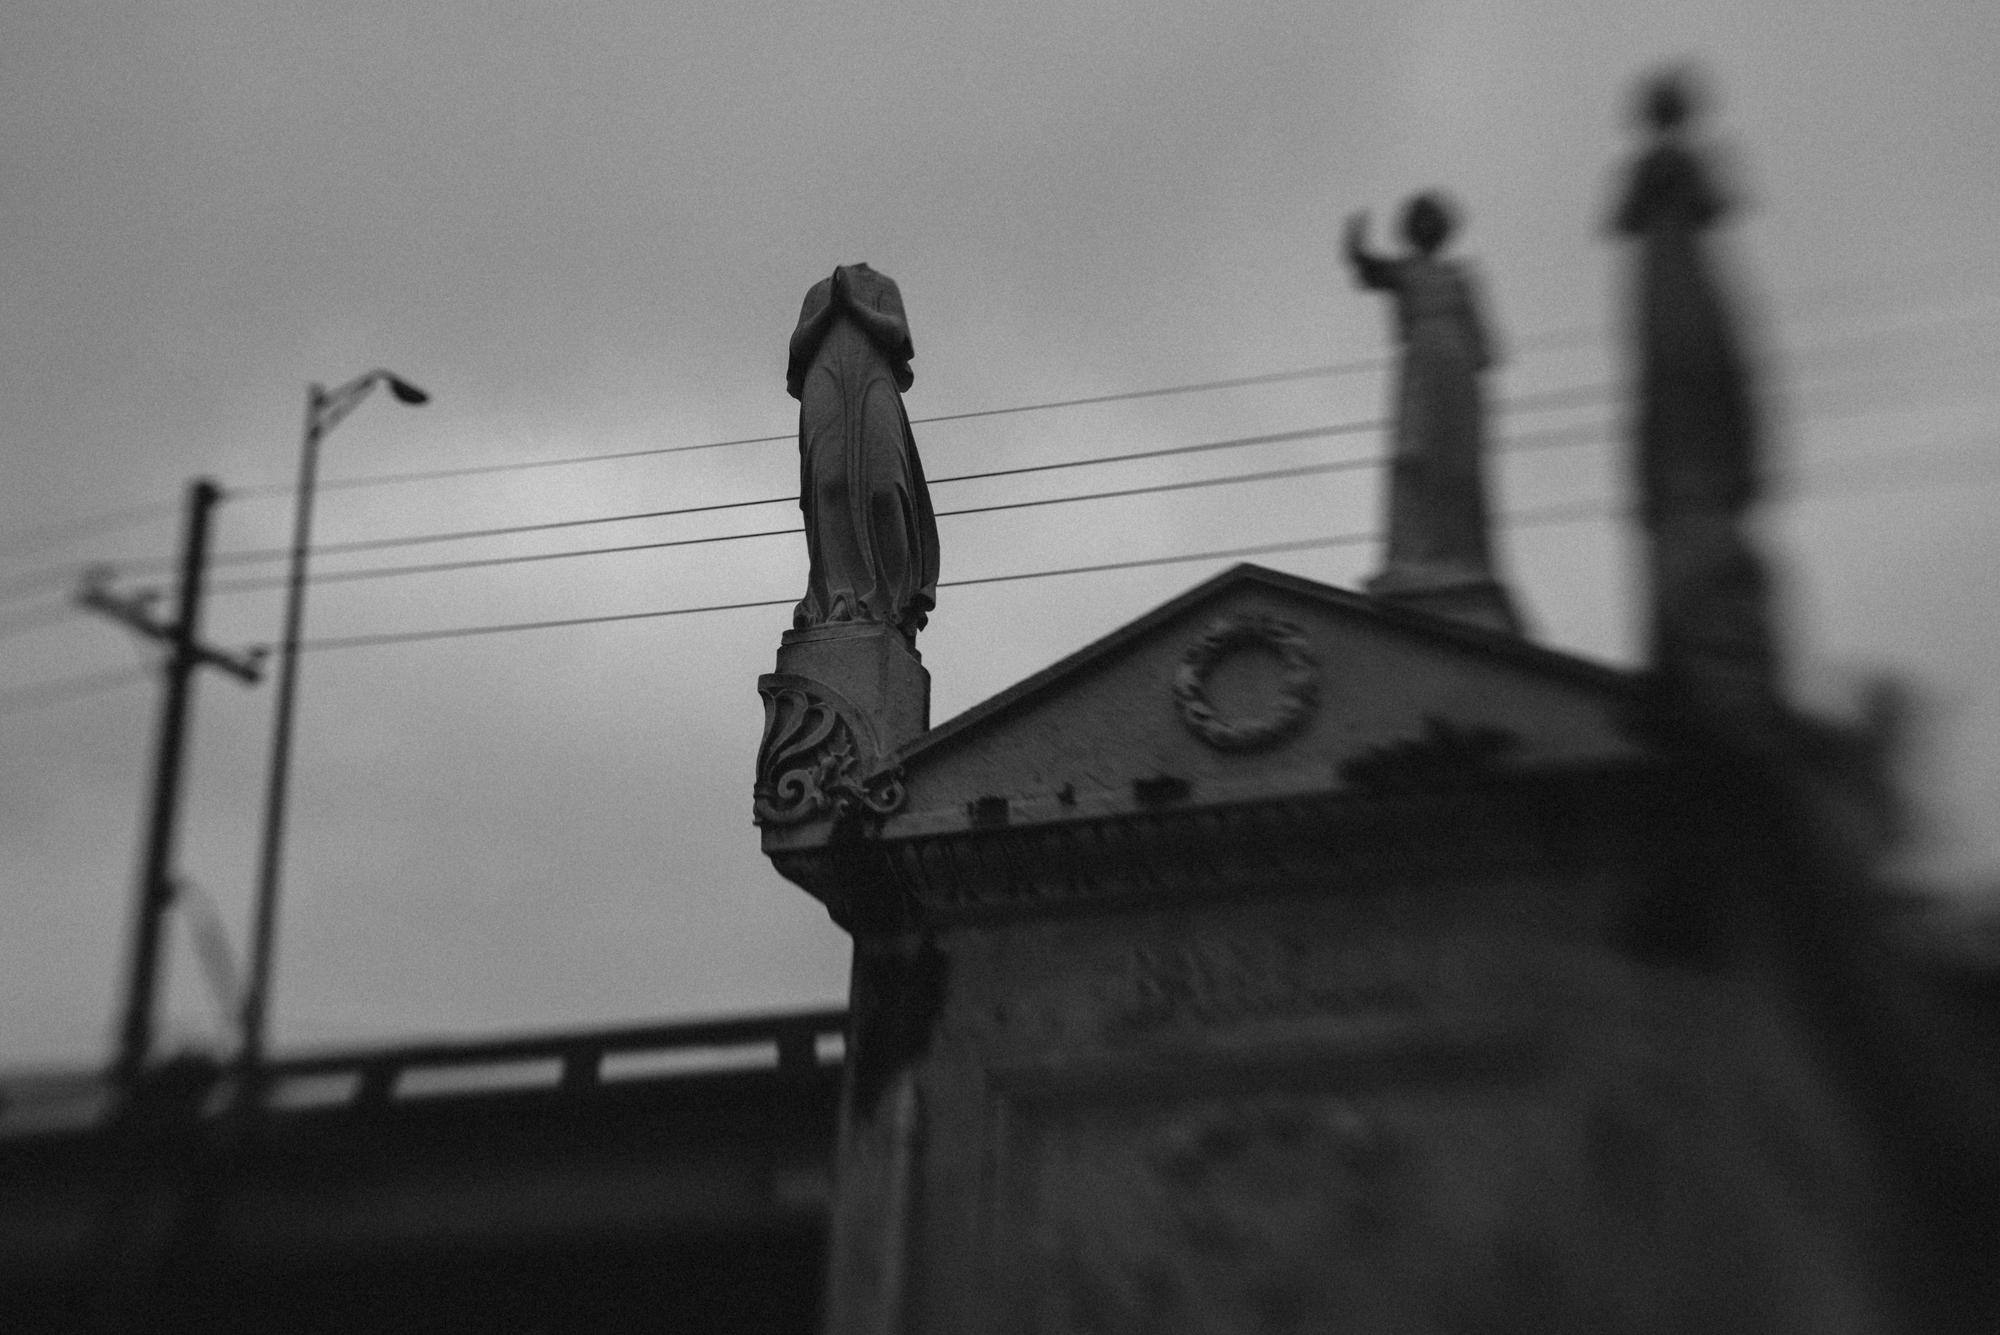 Carlos_Detres_Photography_04812015-03-14.jpg